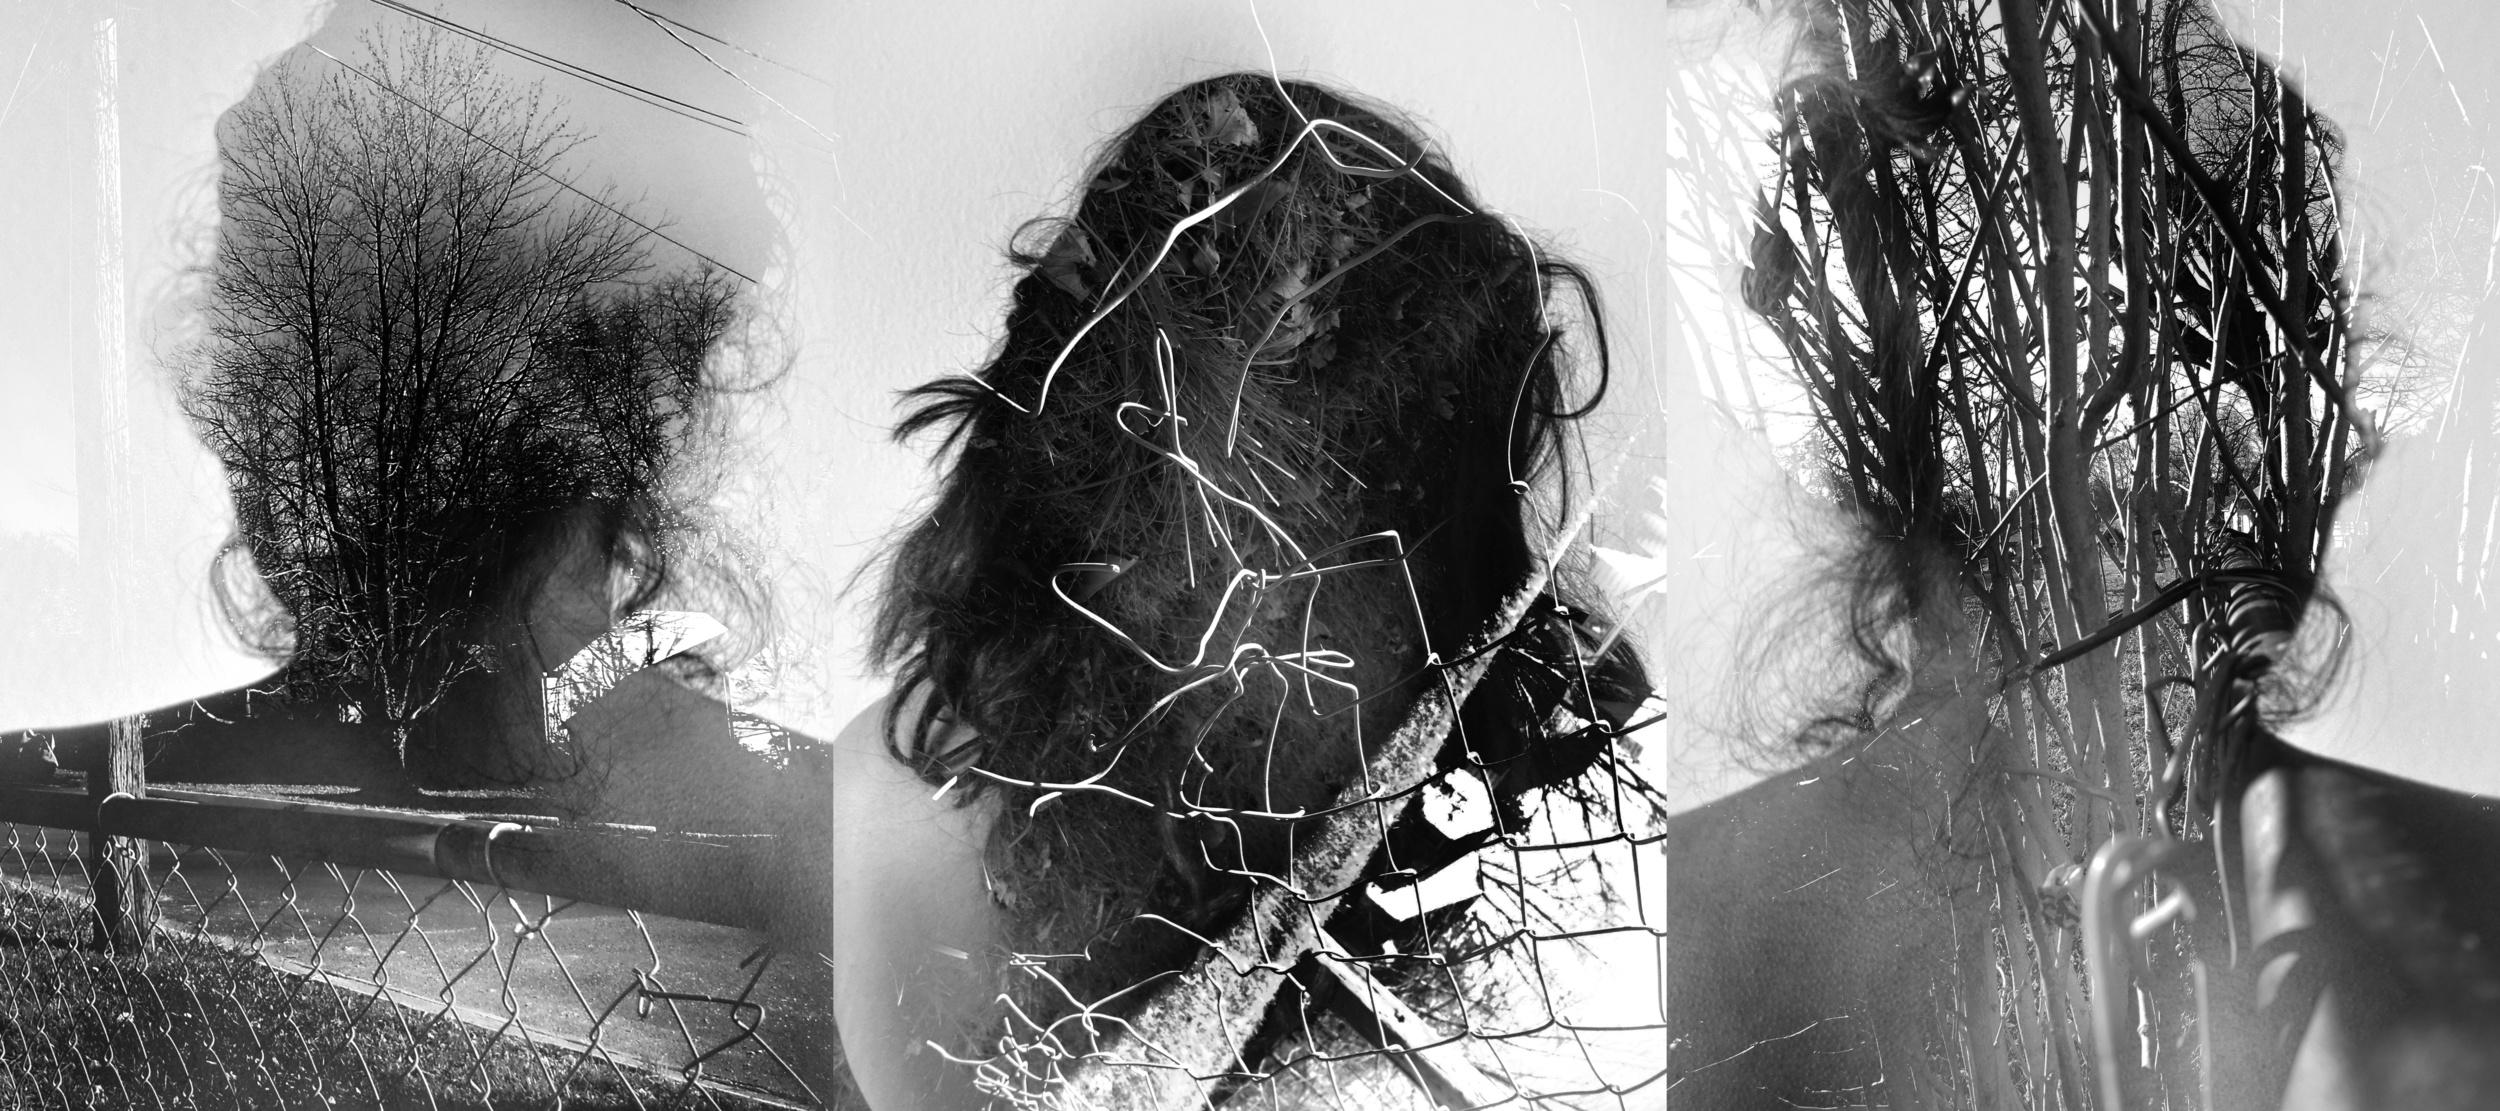 dayal_dilpreet_triptych.jpg